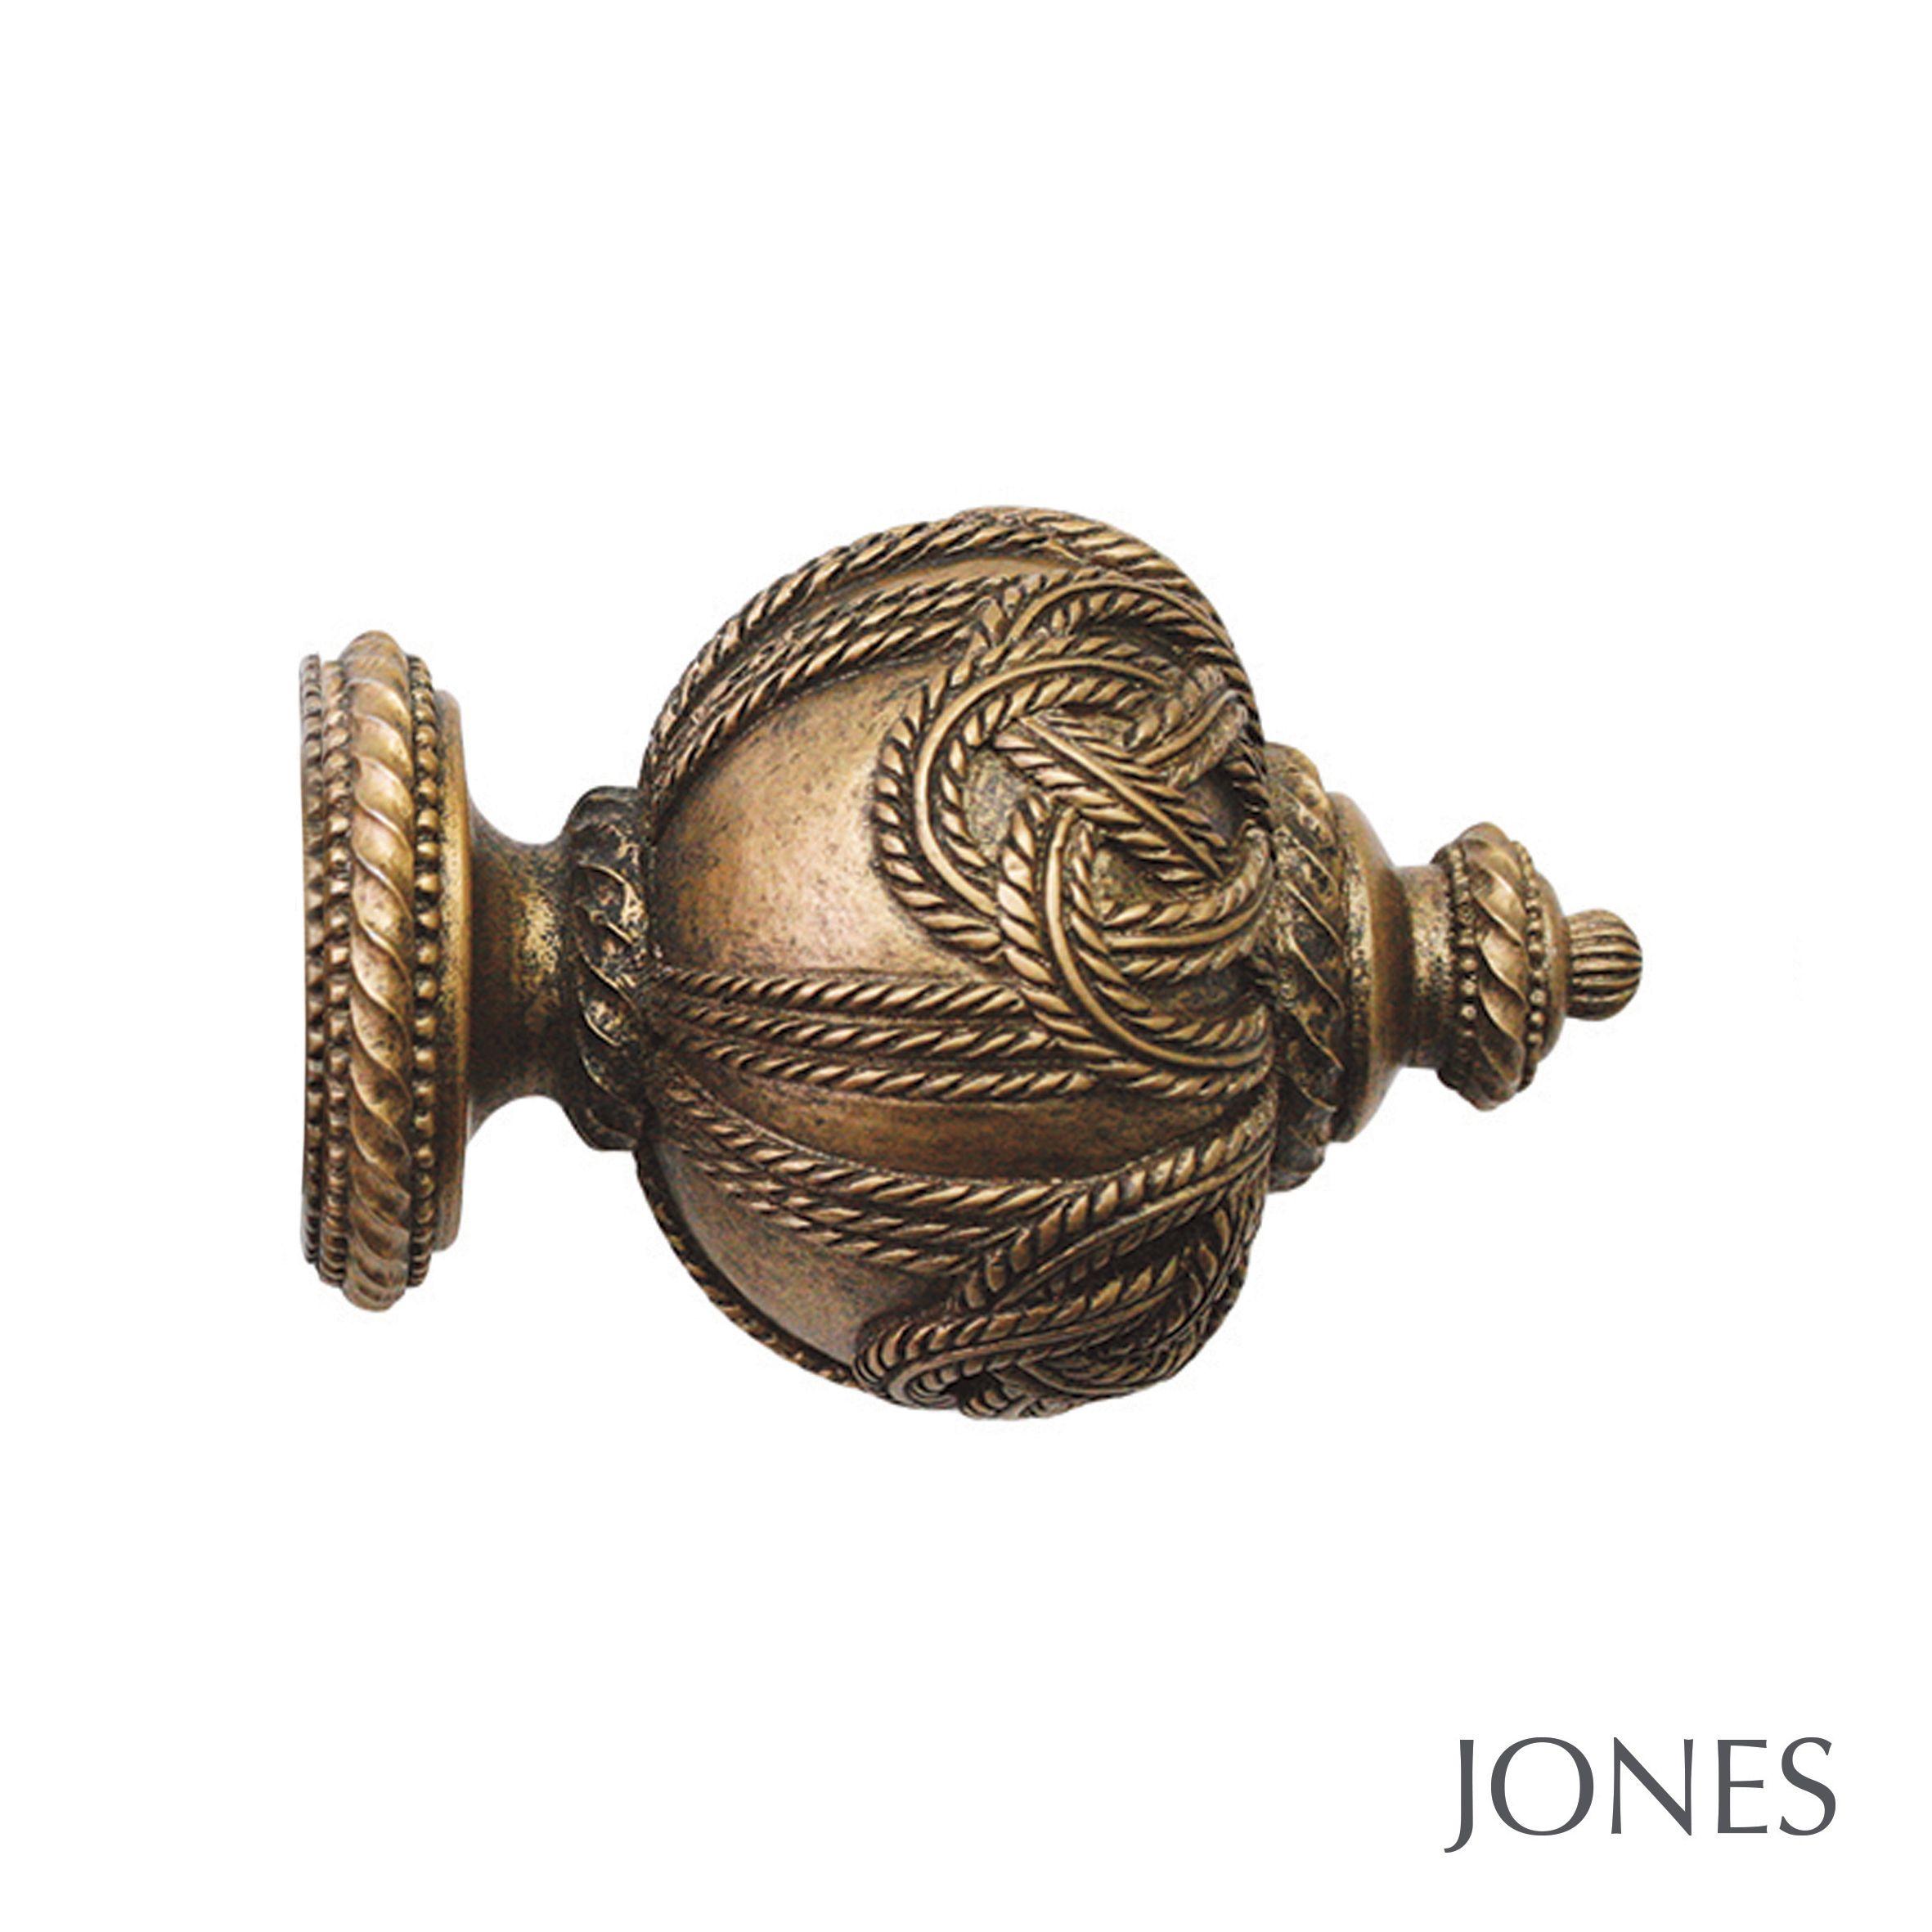 63mm Jones Grande Rope Finial antique gold